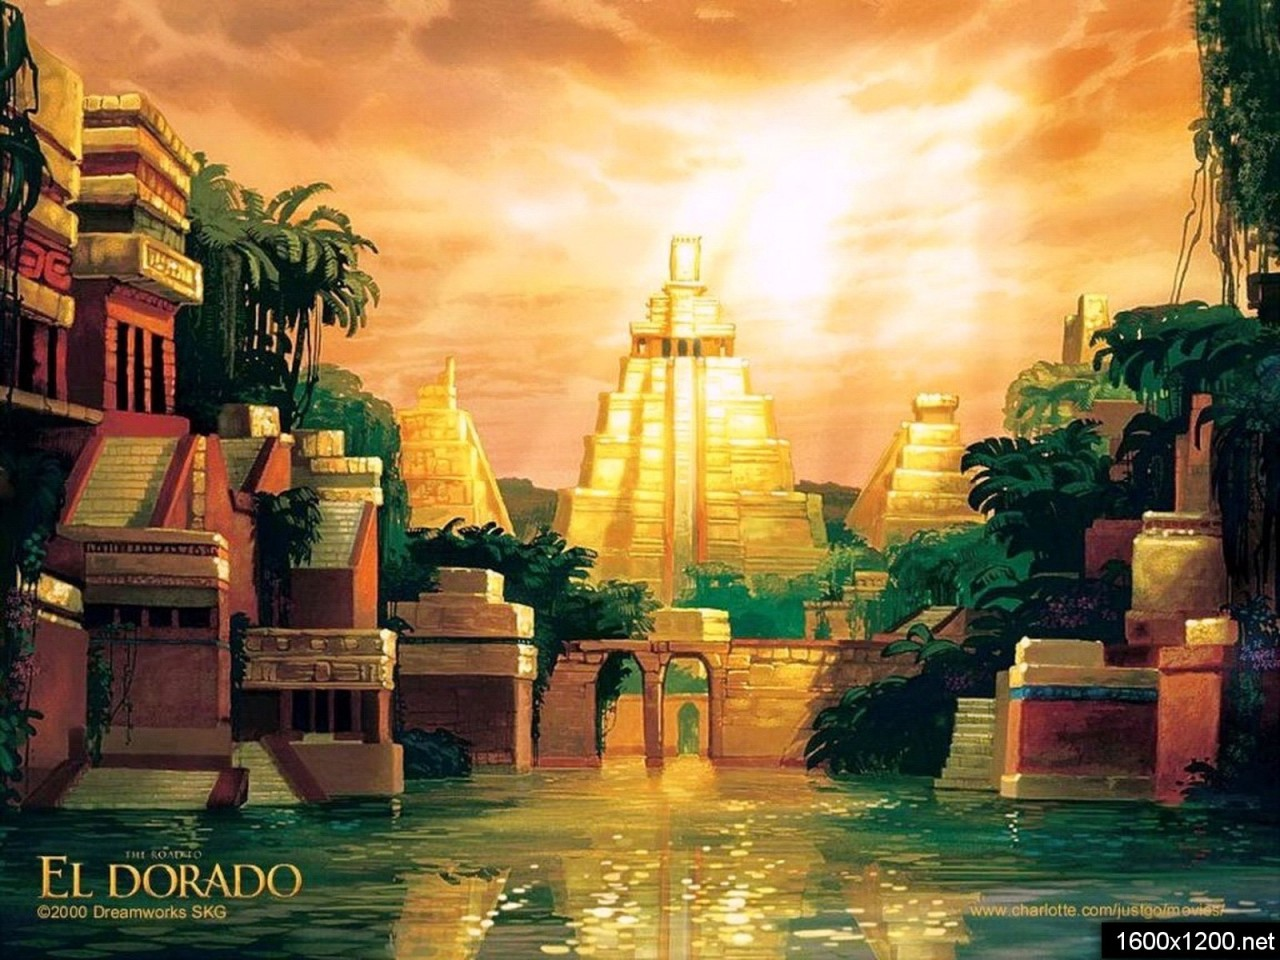 The road to el dorado movie wallpapers wallpapersin4k.net.